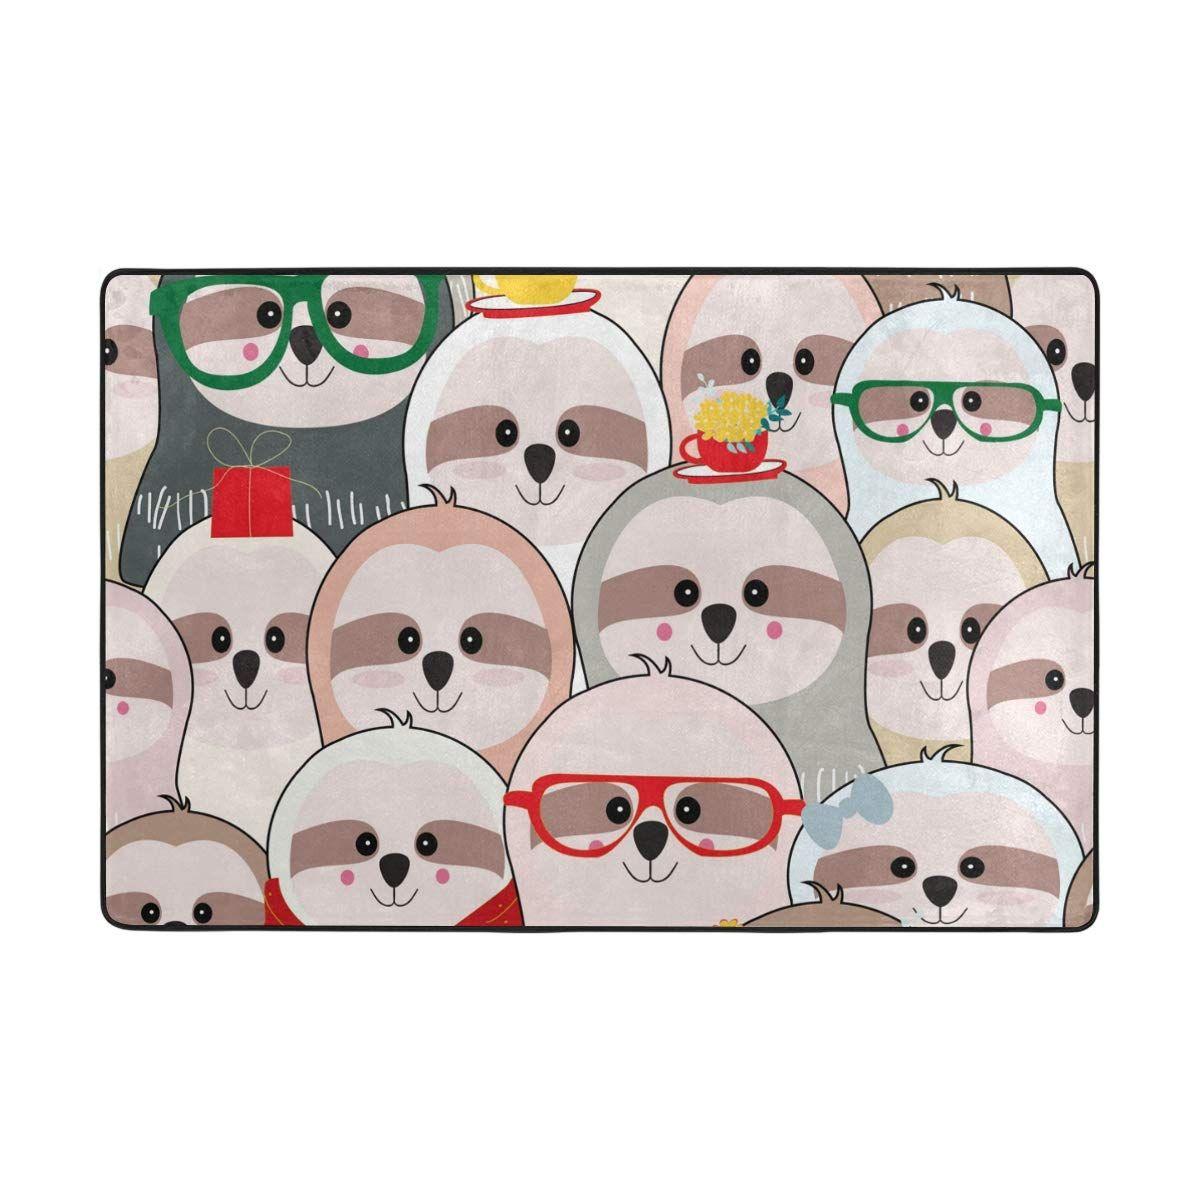 Vantaso Soft Foam Area Rugs Cute Sloth Non Slip for Kids